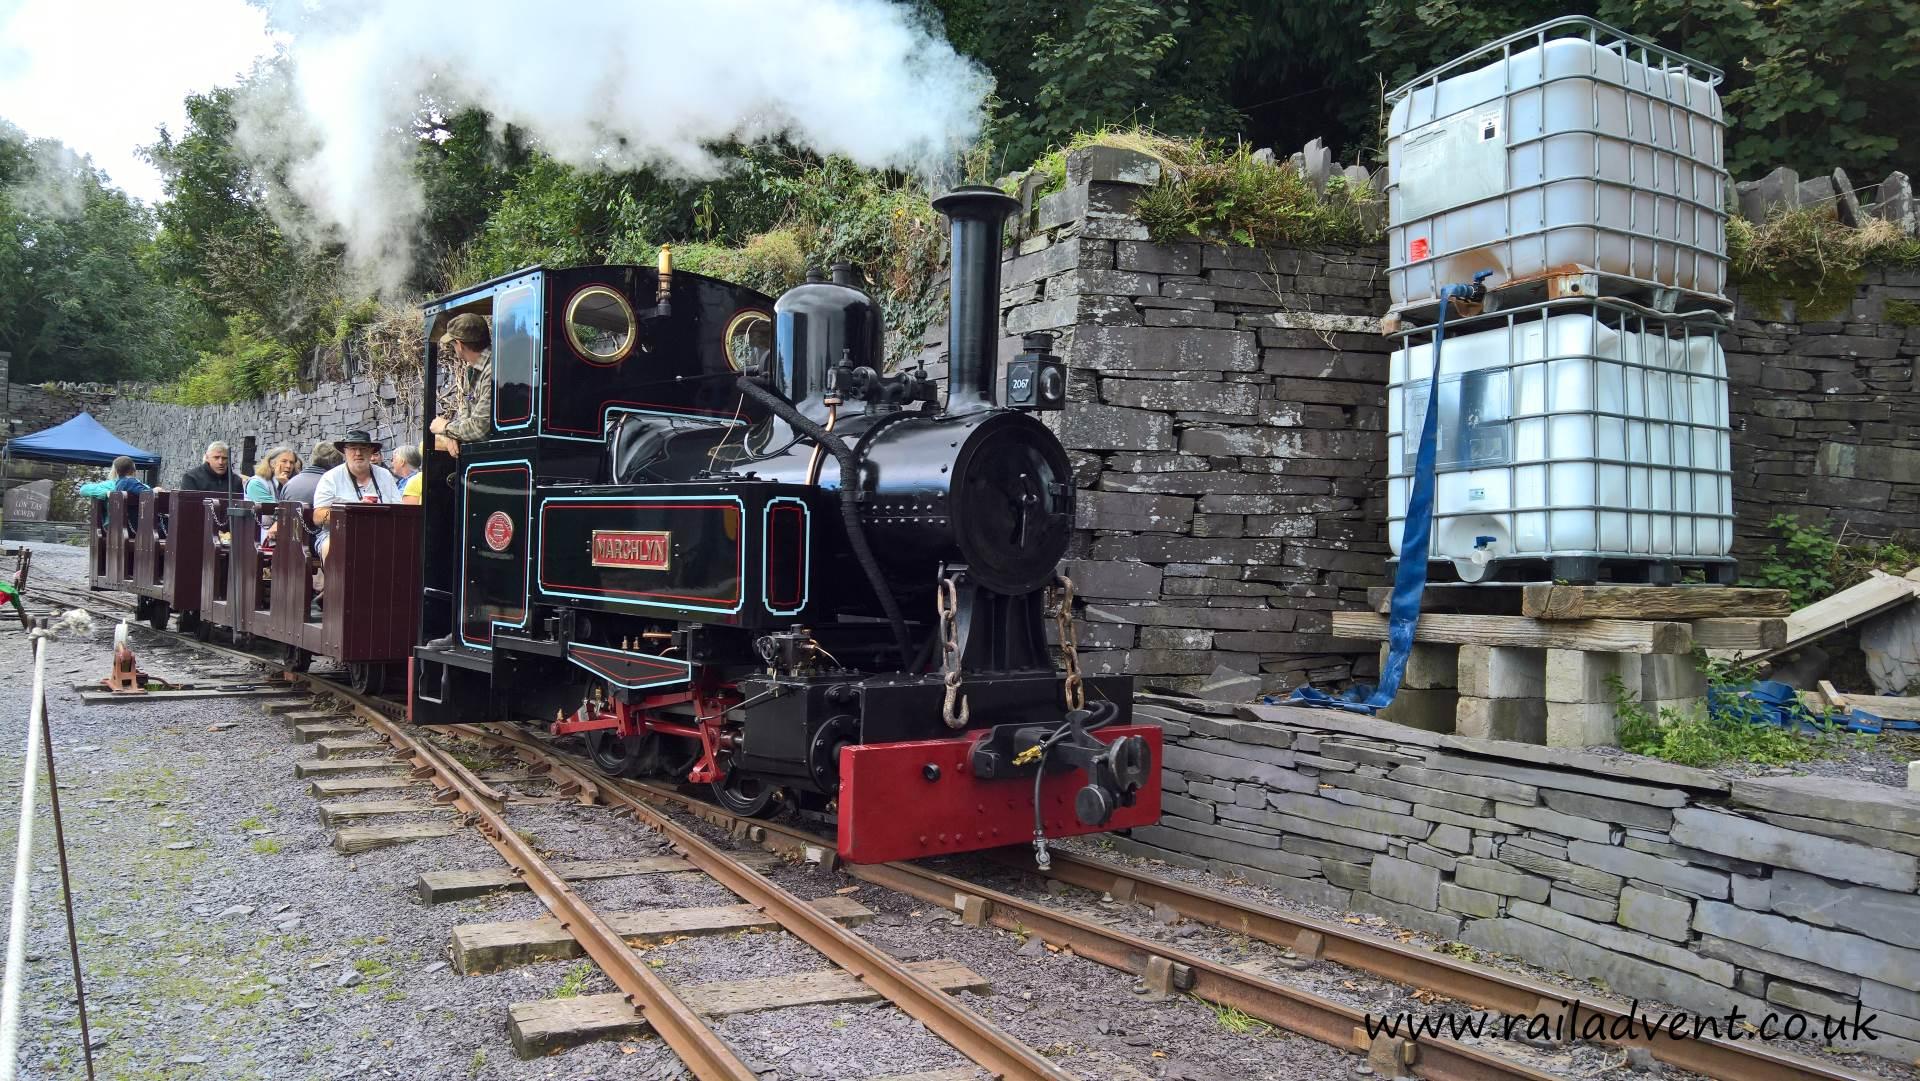 Marchlyn on the Penrhyn Quarry Railway during Penrhyn Redirected